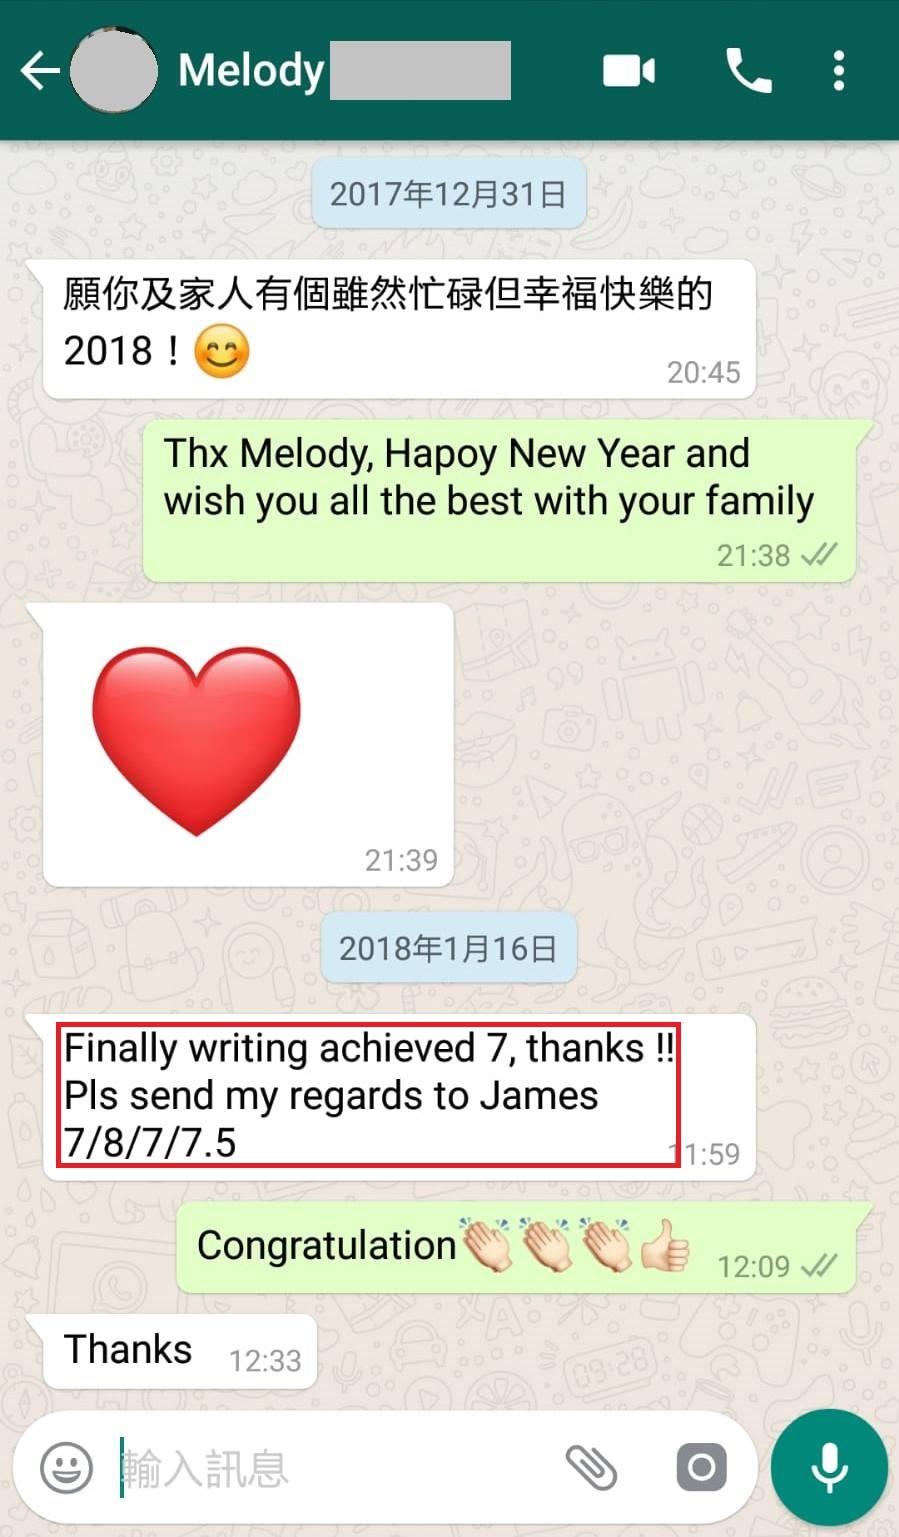 🎉 James' Tips ️